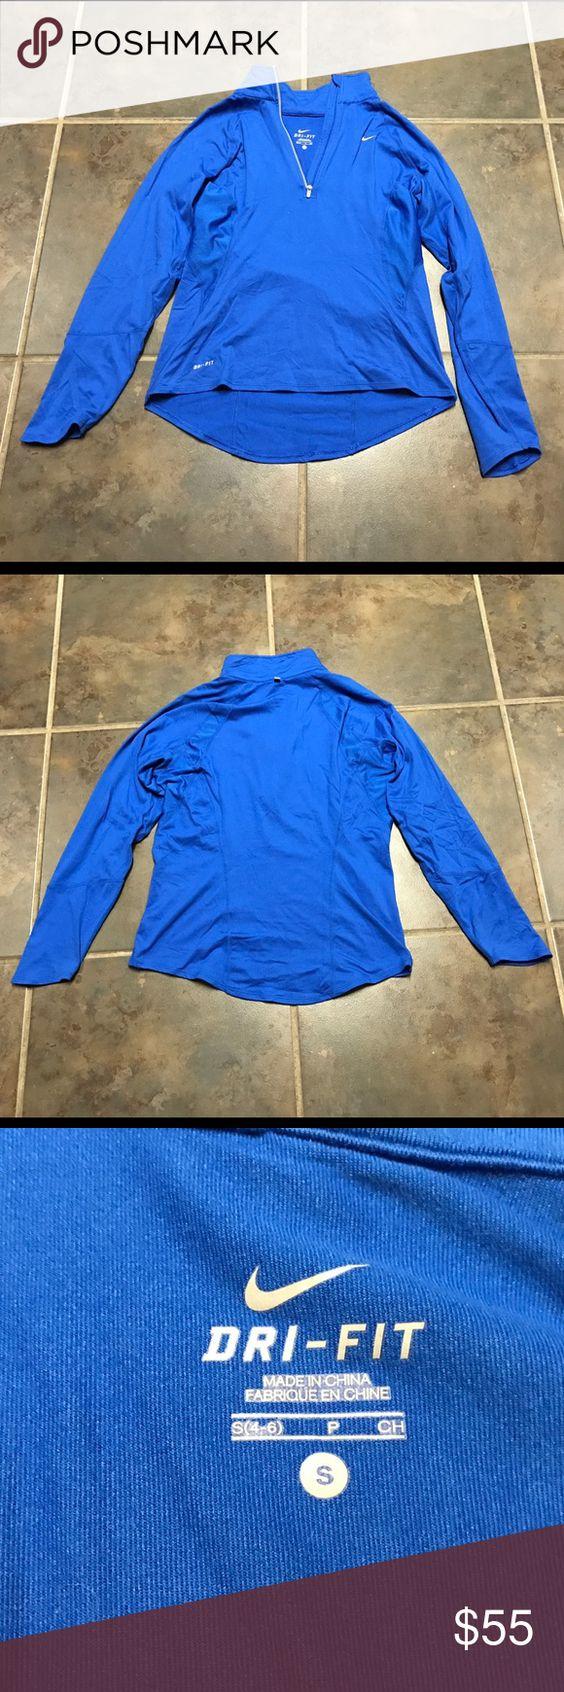 NIKE dri-fit pullover. LIKE NEW!! Beautiful bright blue NIKE dri-fit pullover. LIKE NEW!! Nike Tops